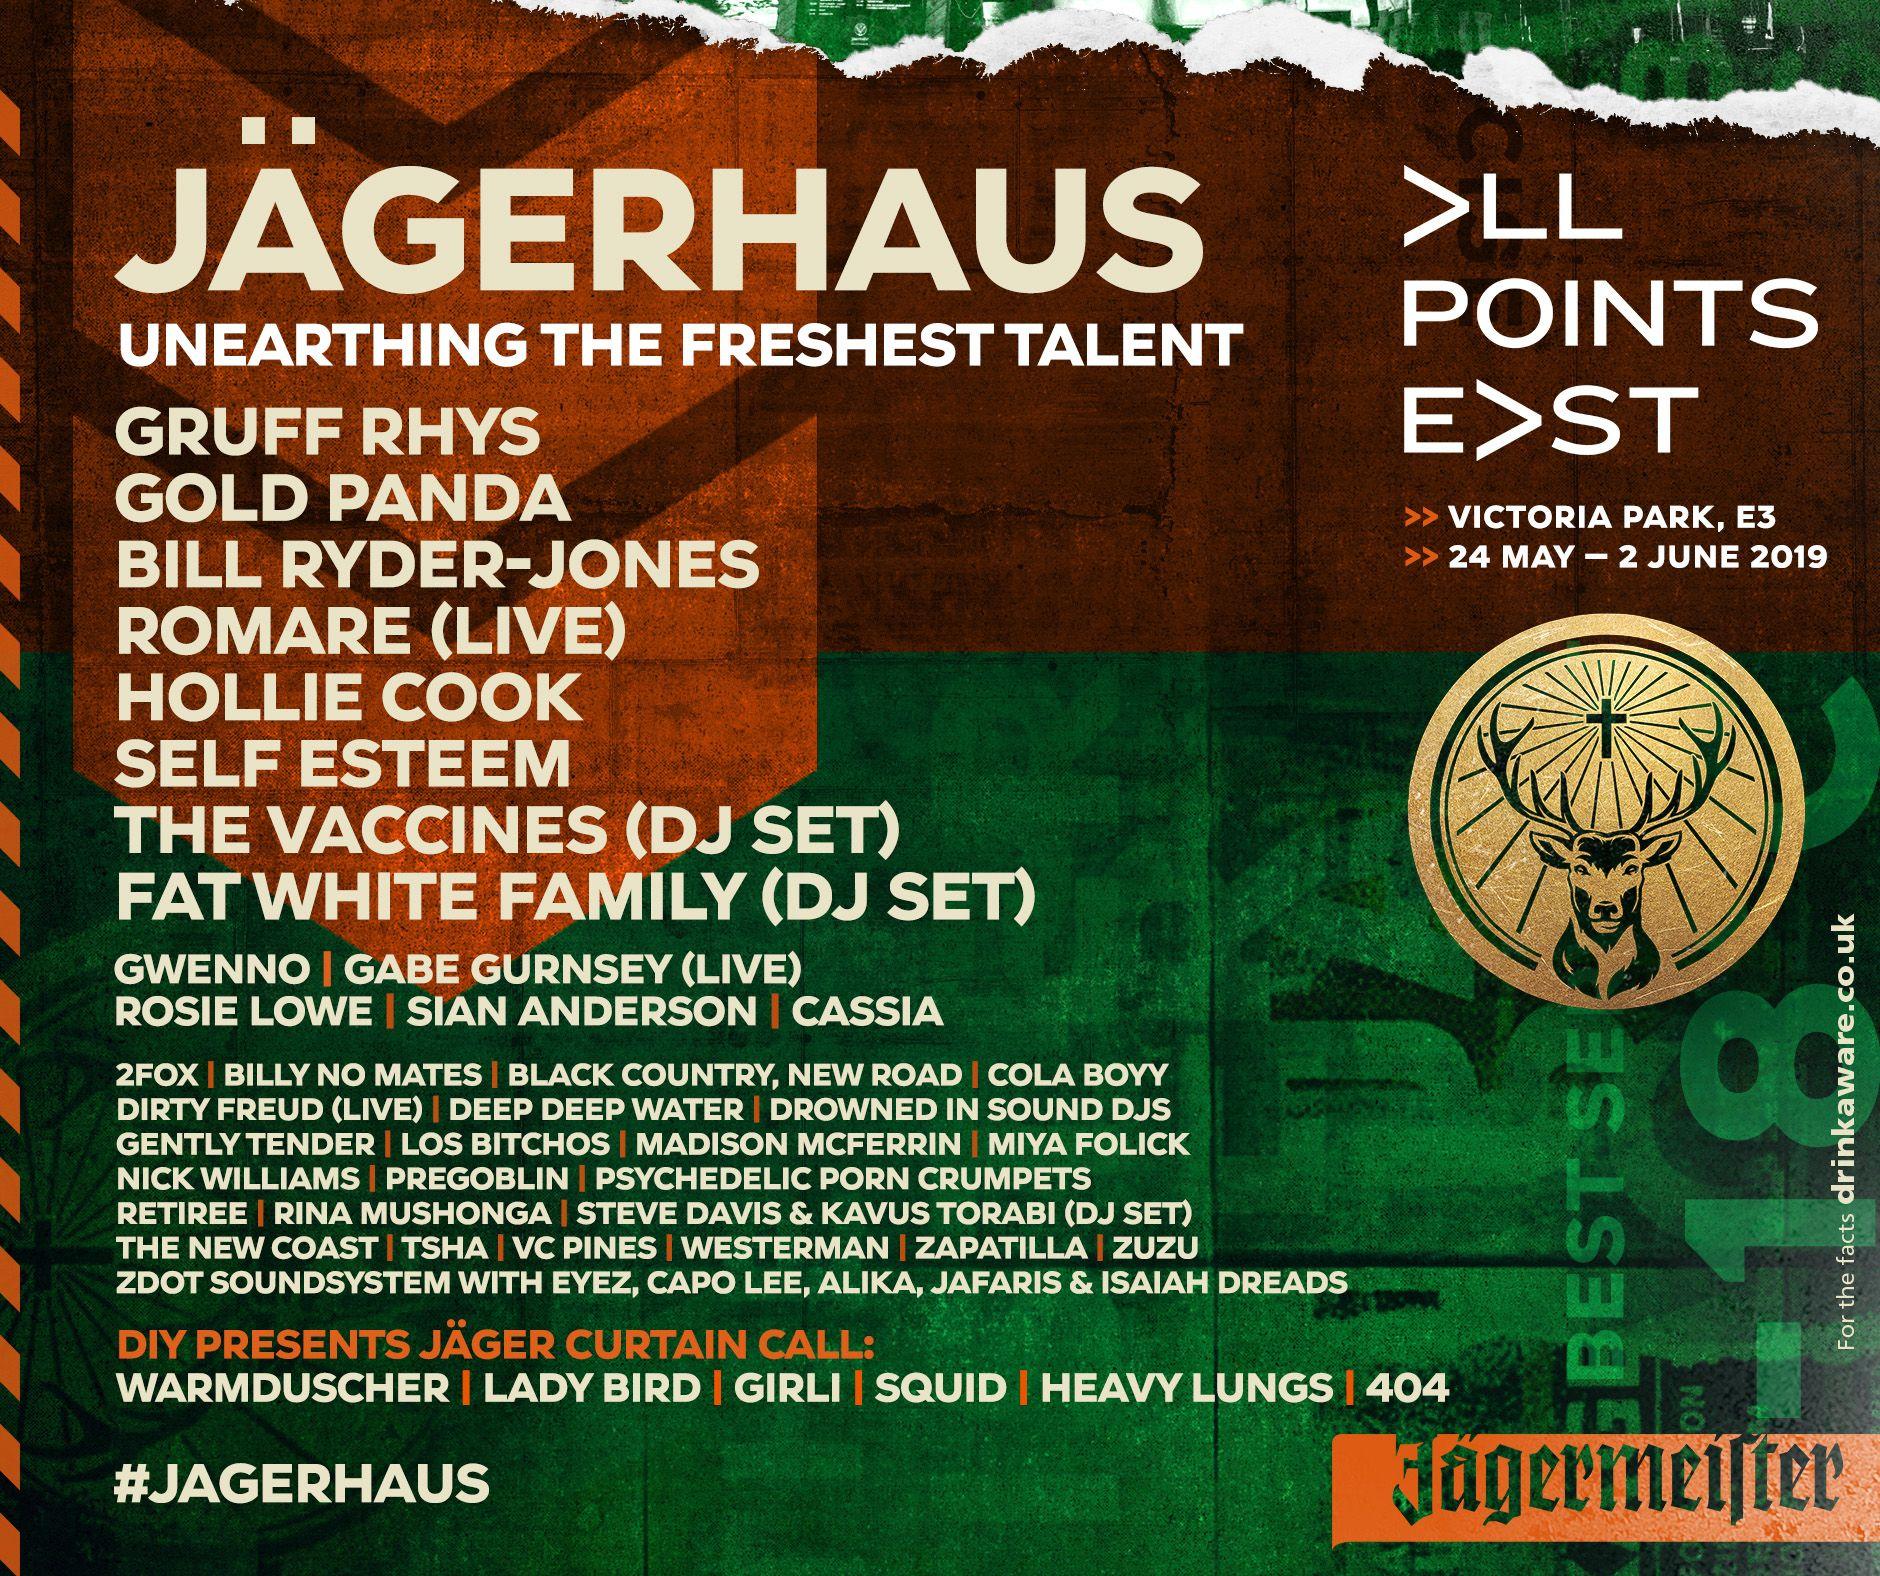 jagerhaus_poster.jpg